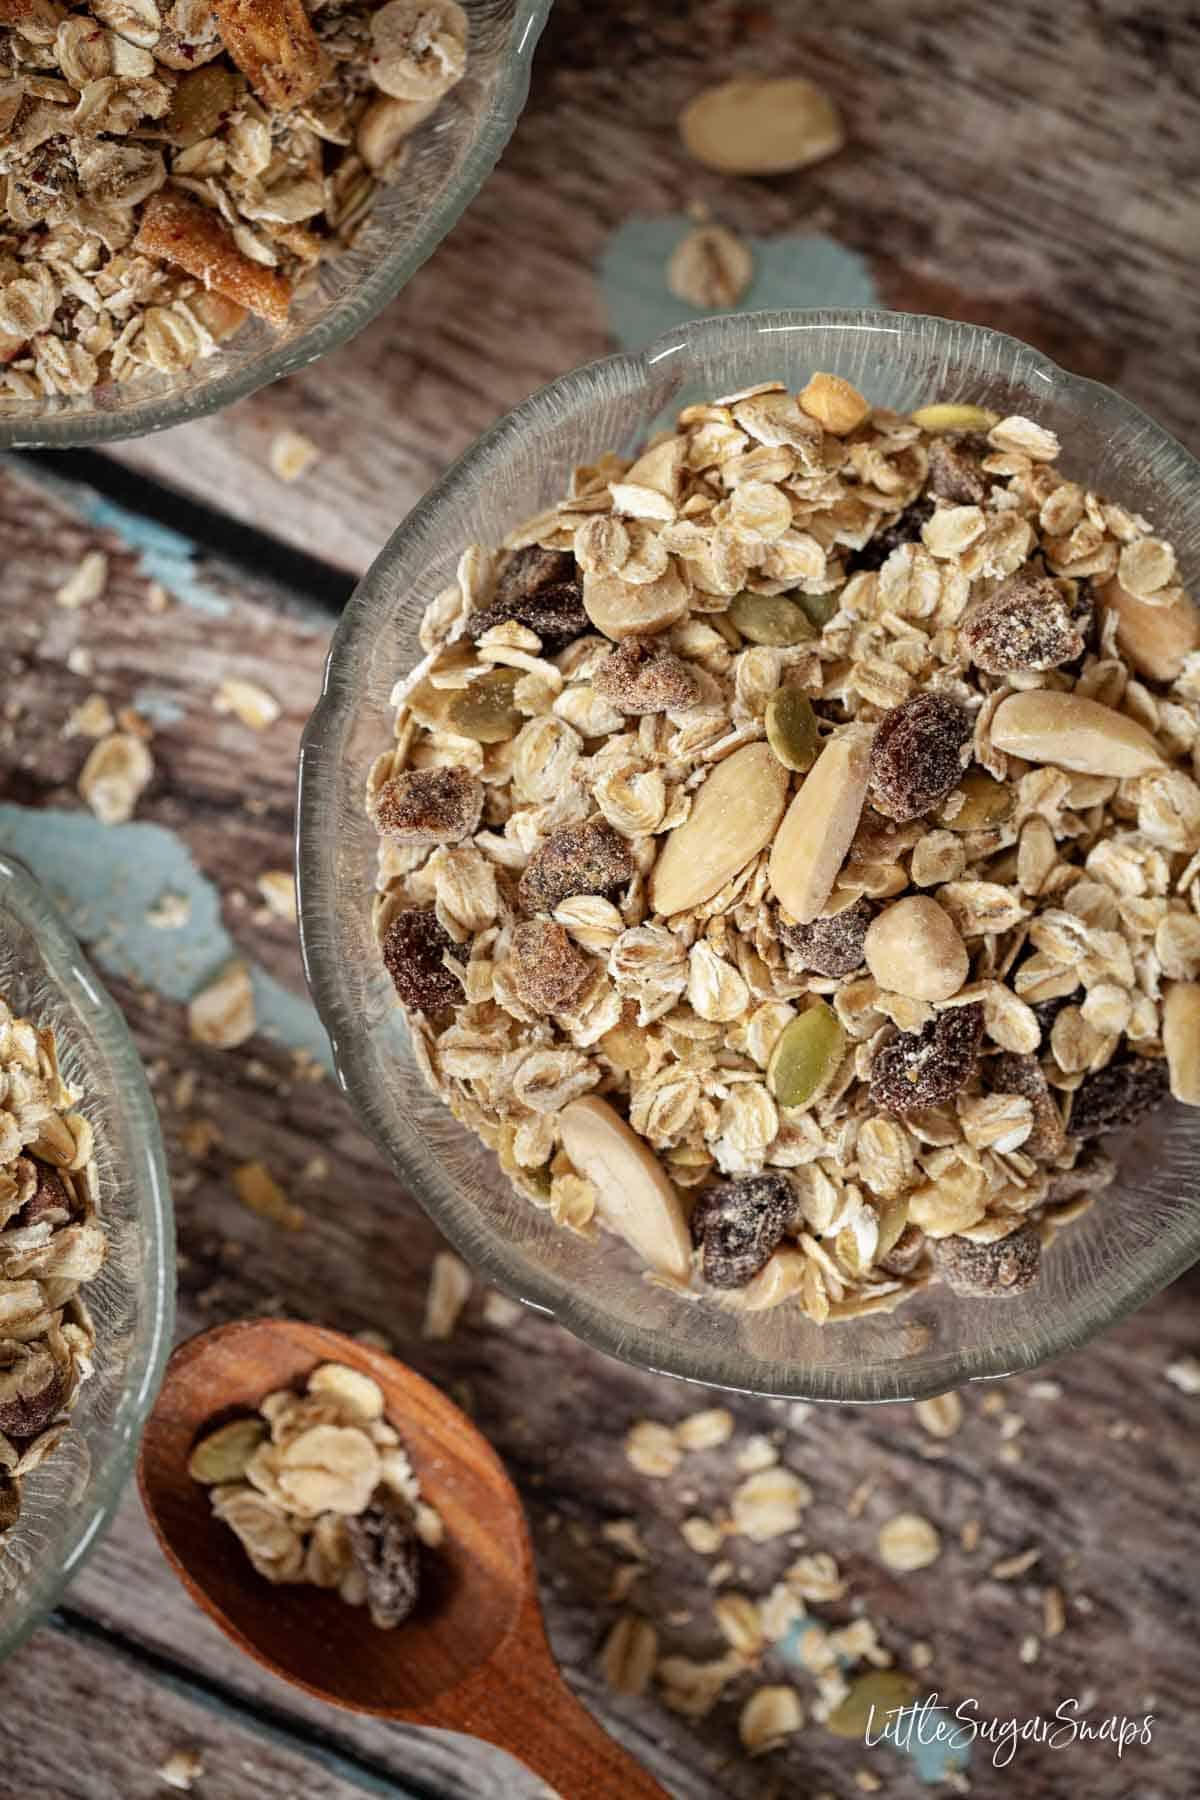 Bowls of homemade muesli with dates, raisins, almonds and hazelnuts